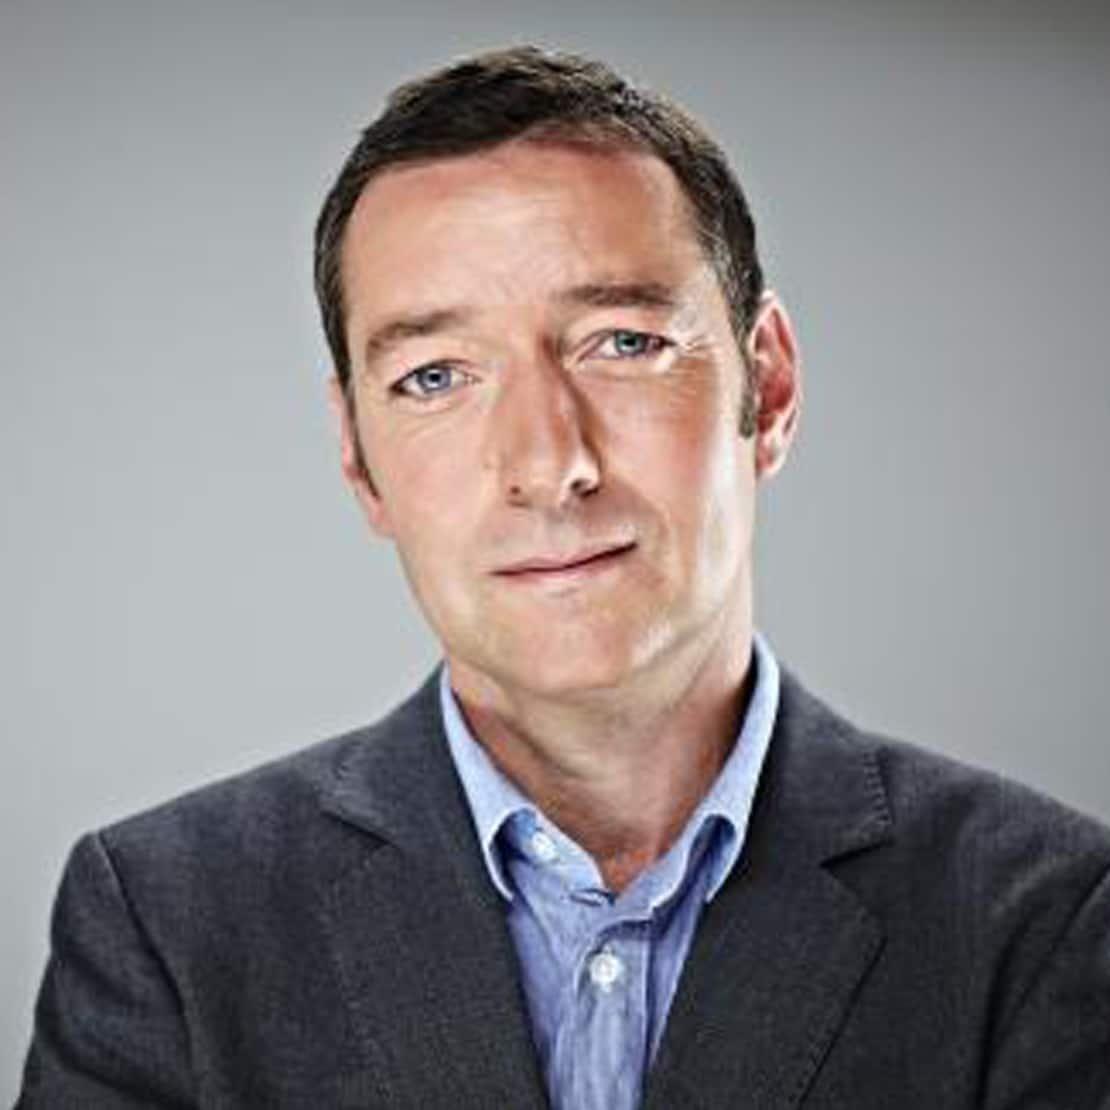 Ned-Boulting-cycling-reporter-presenter-writer-Award-winning-speaker-host-at-Great-British-Speakers